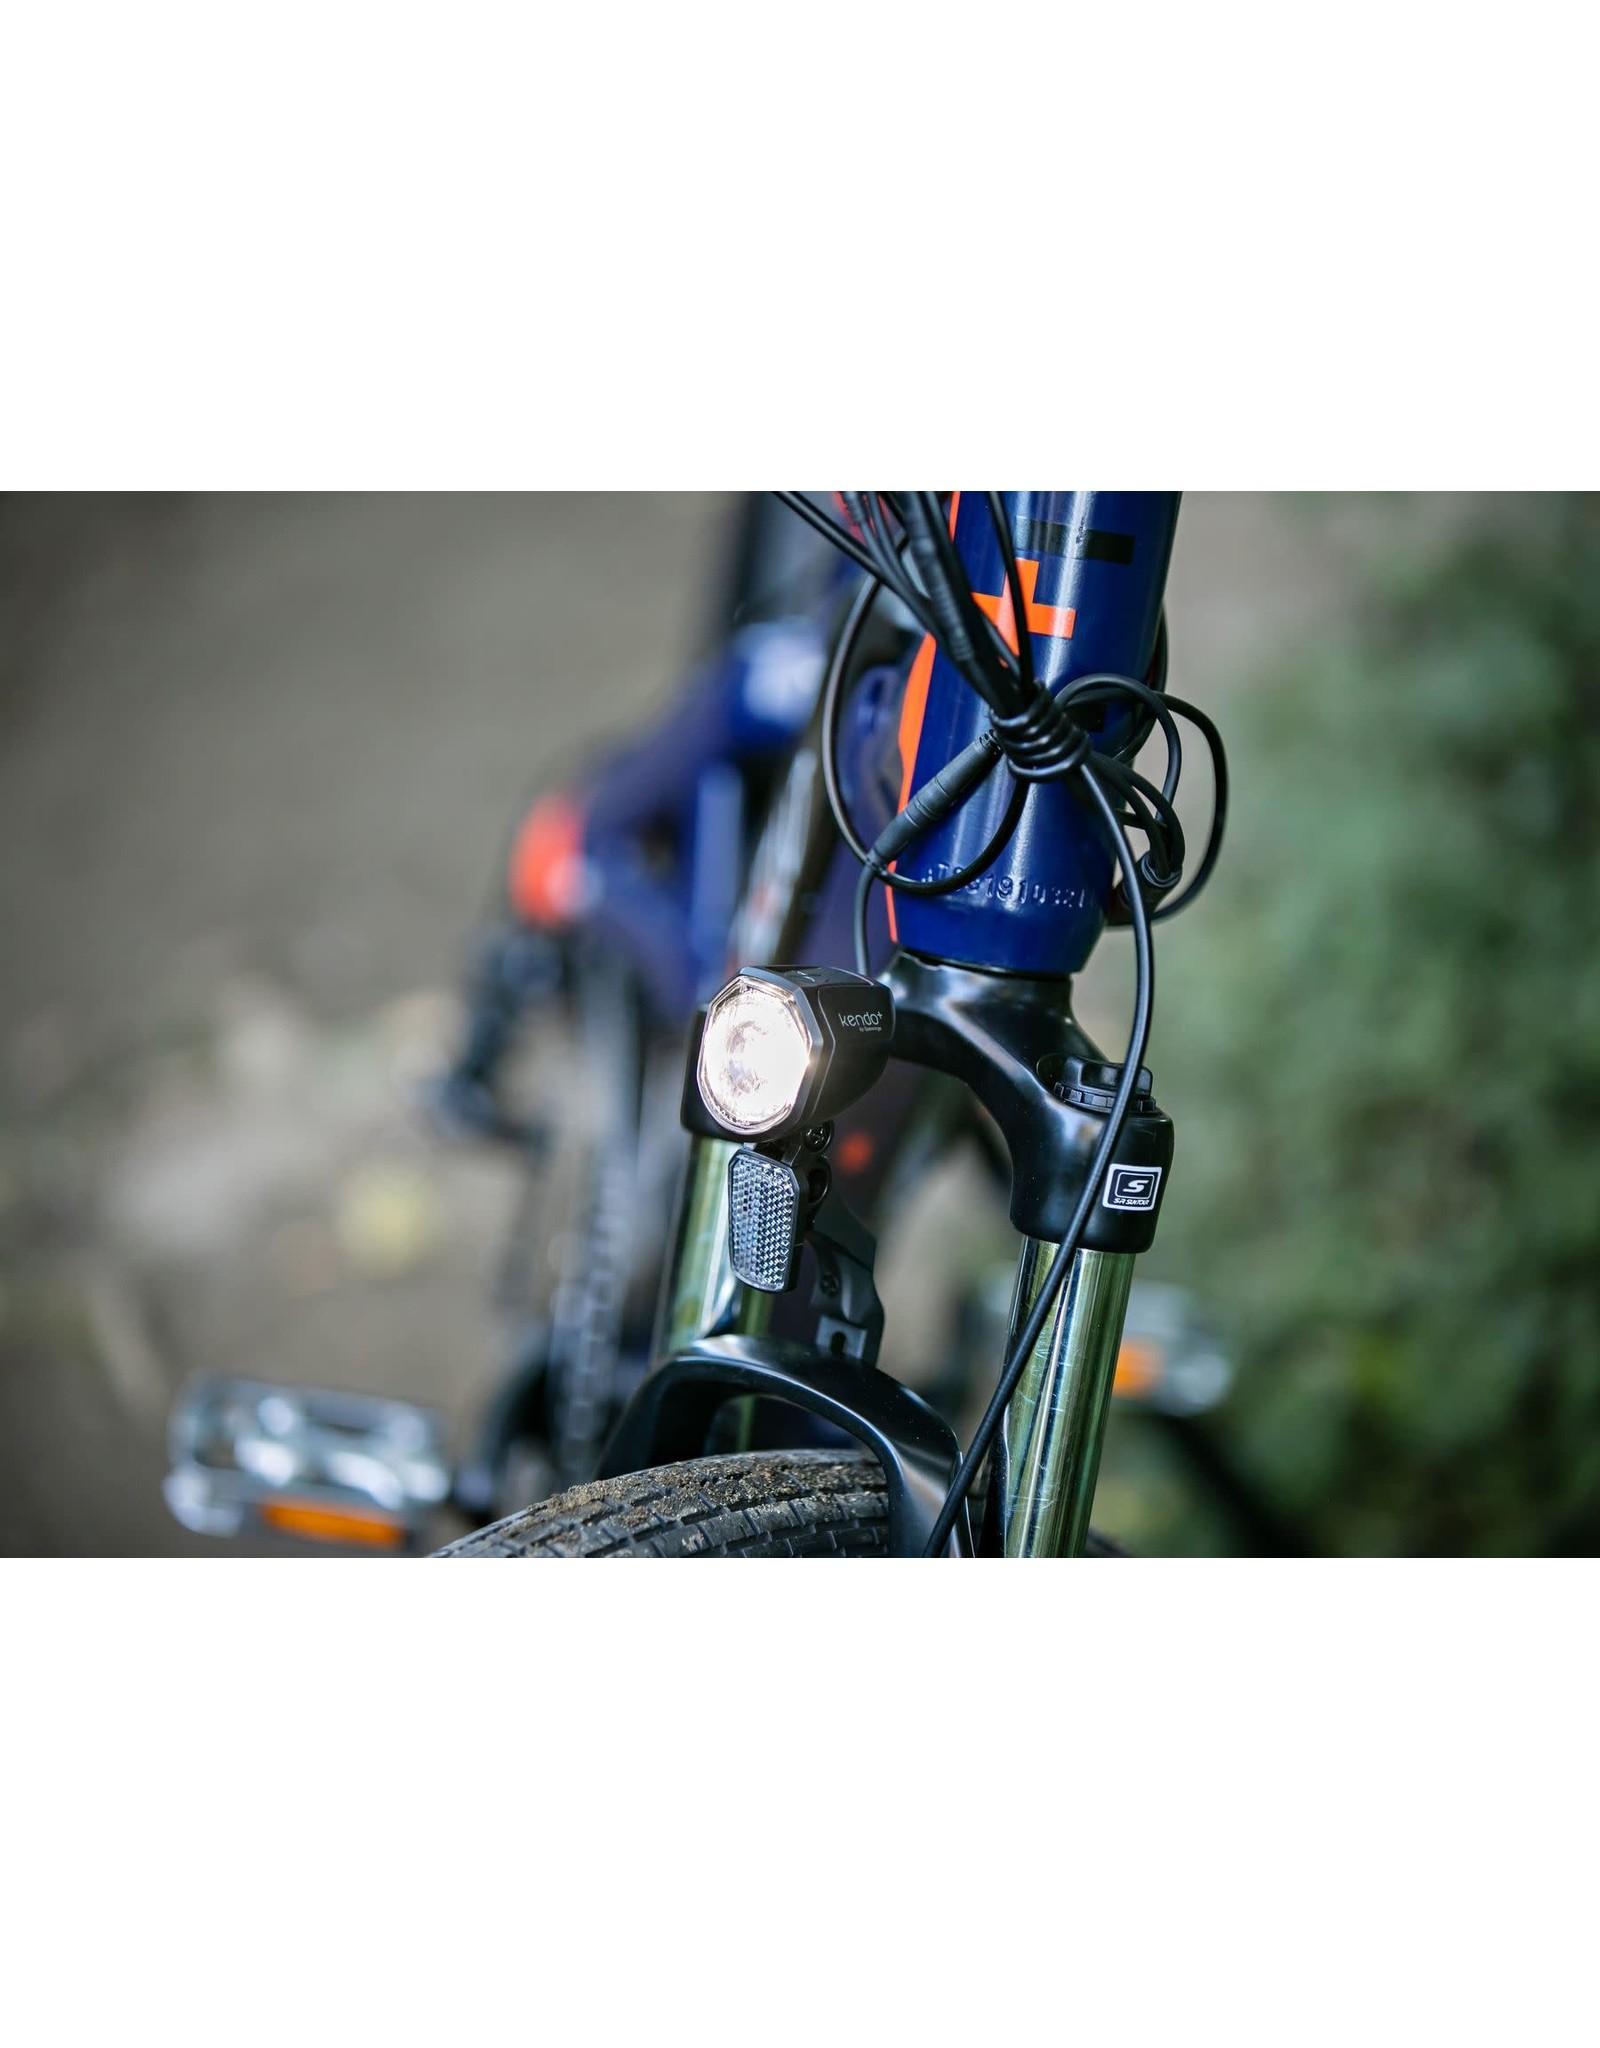 Evelo Evelo Aries Full Suspension E- Bike